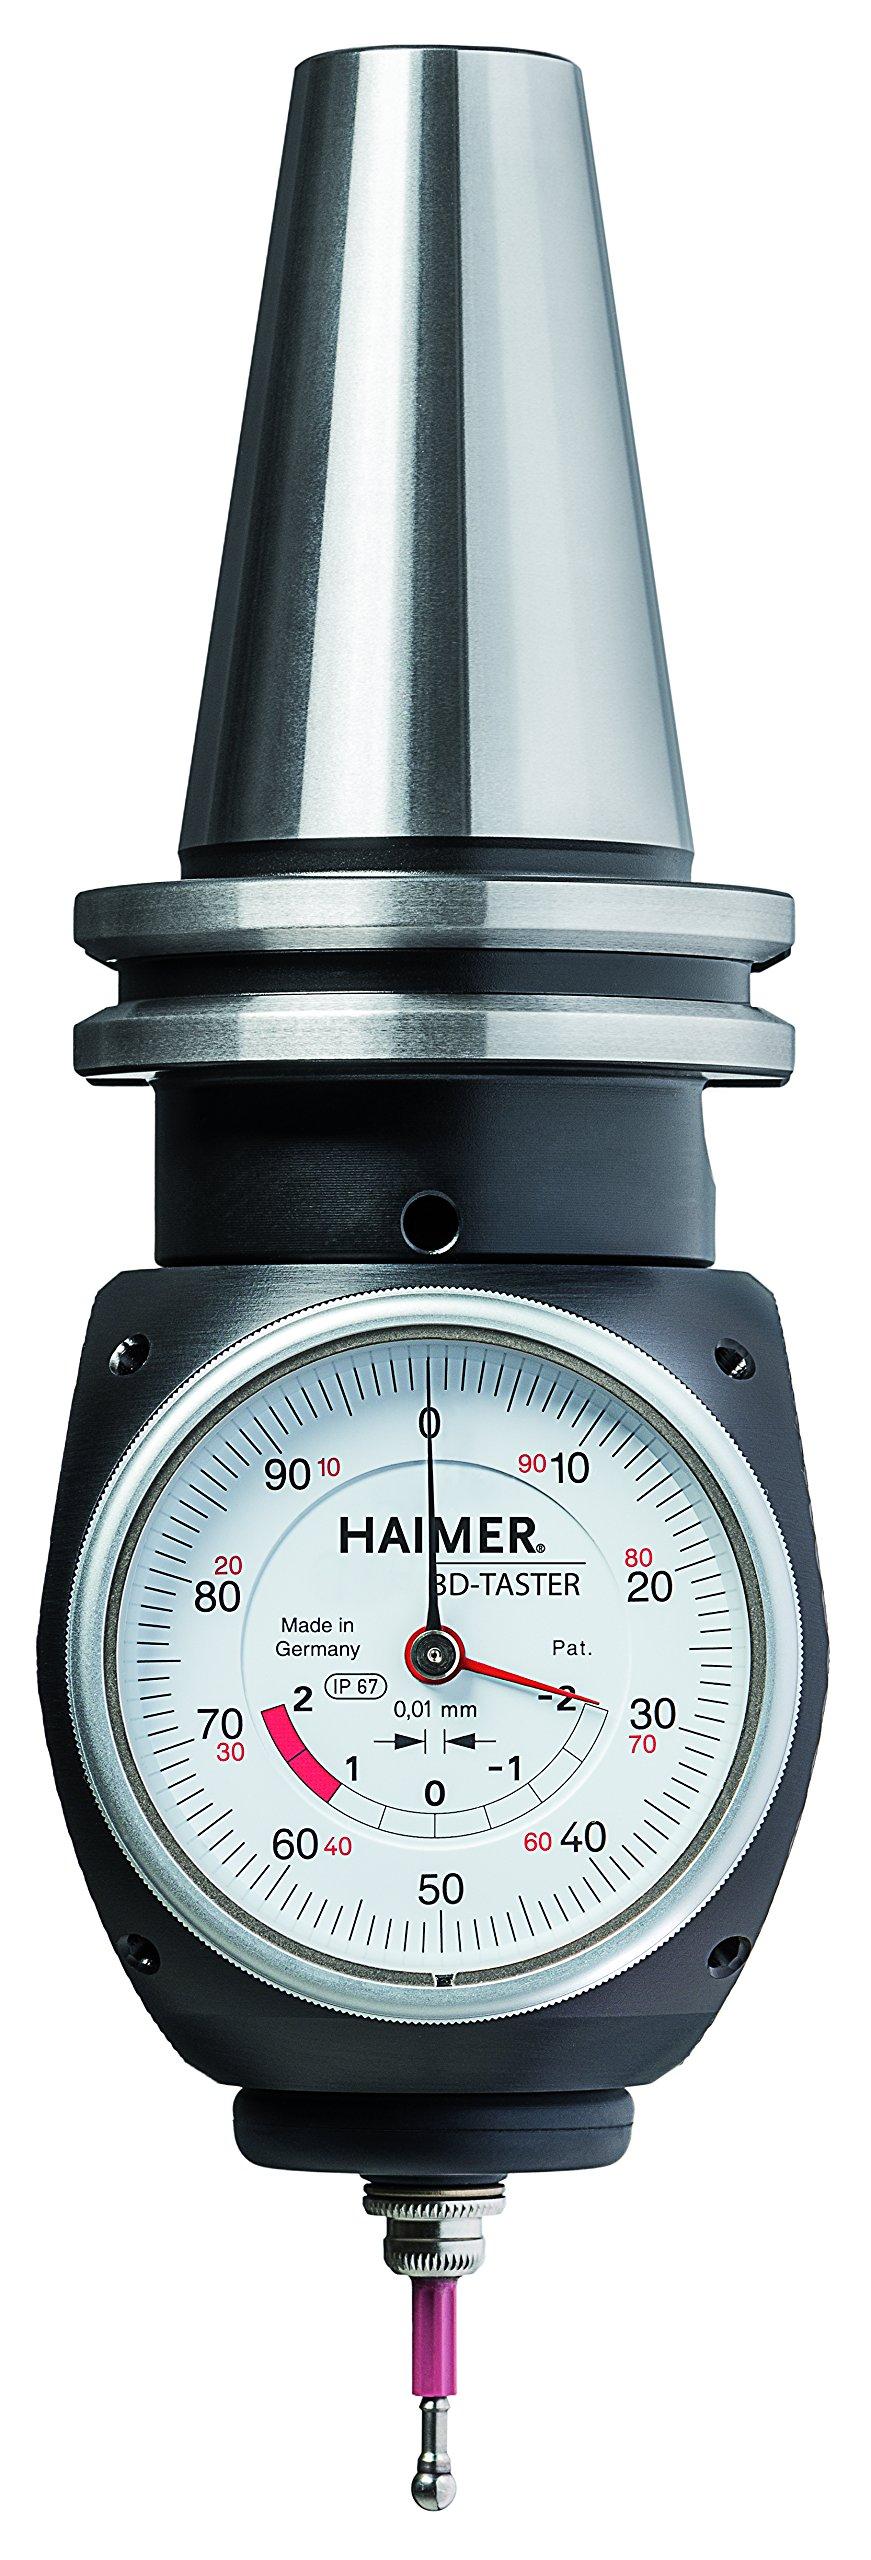 Haimer 80.365.30NG 3D-Sensor New Generation with Integrated Taper BT30